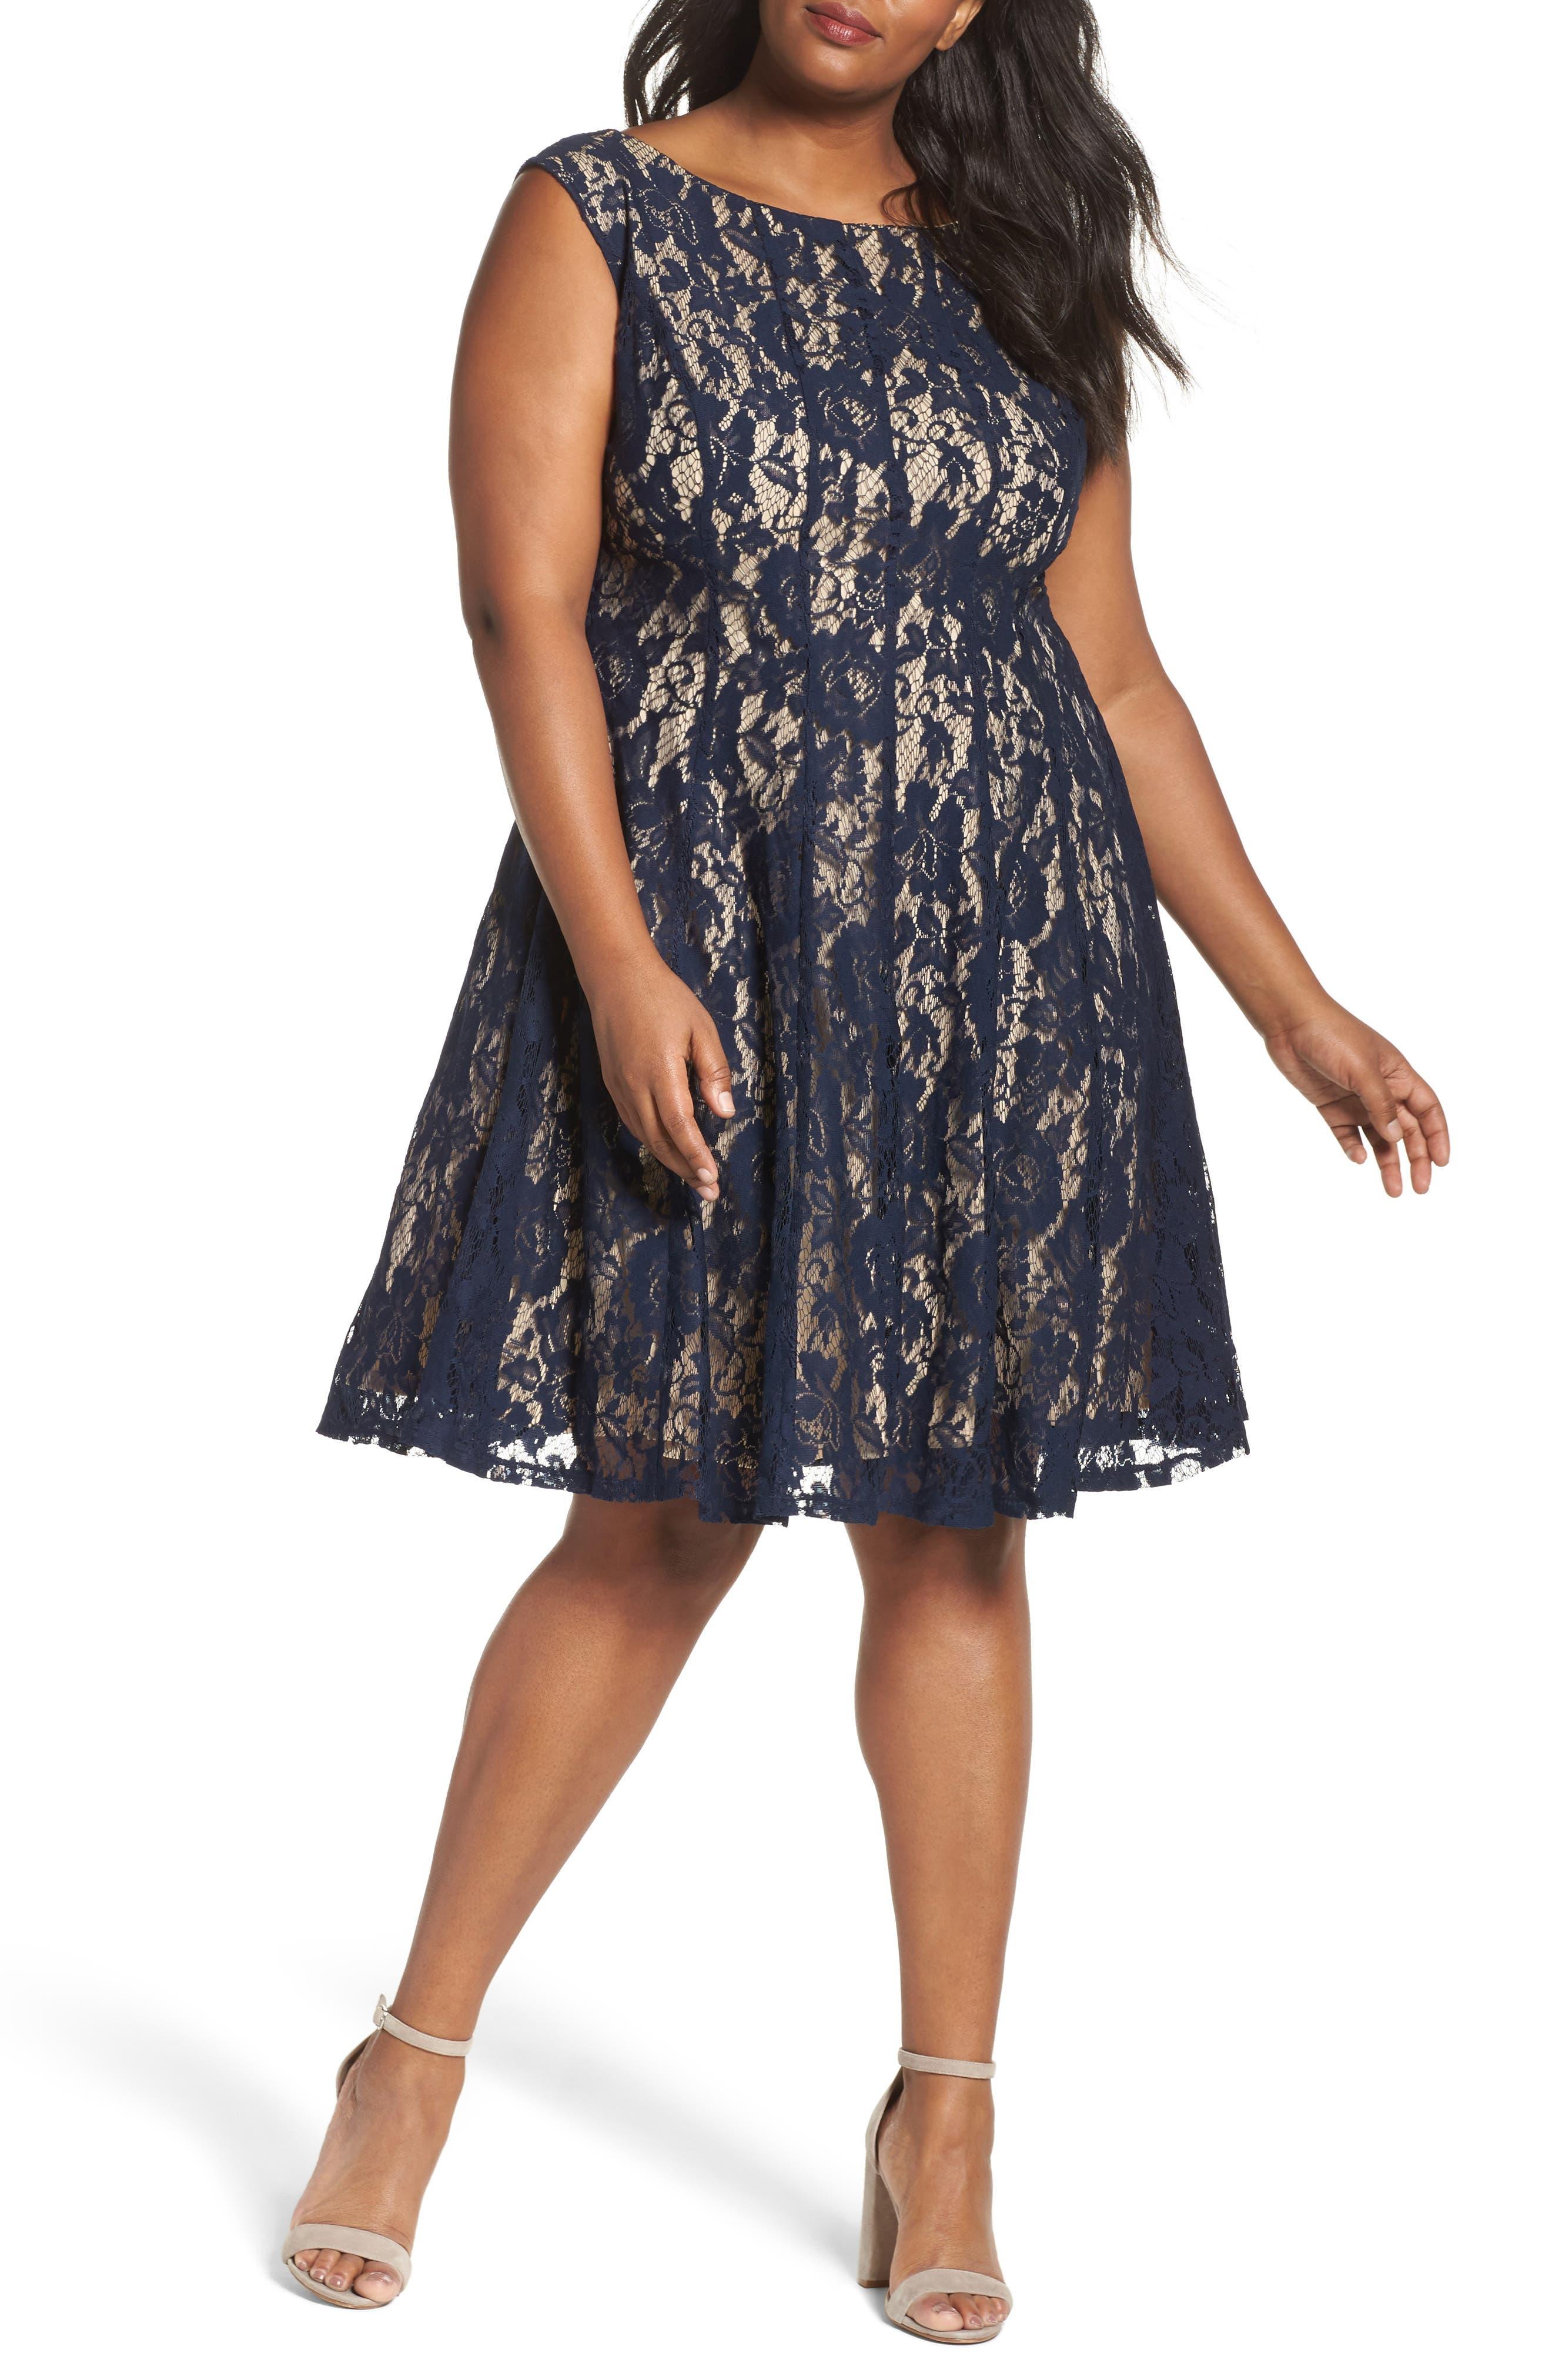 Gabby skye floral lace peplum dress